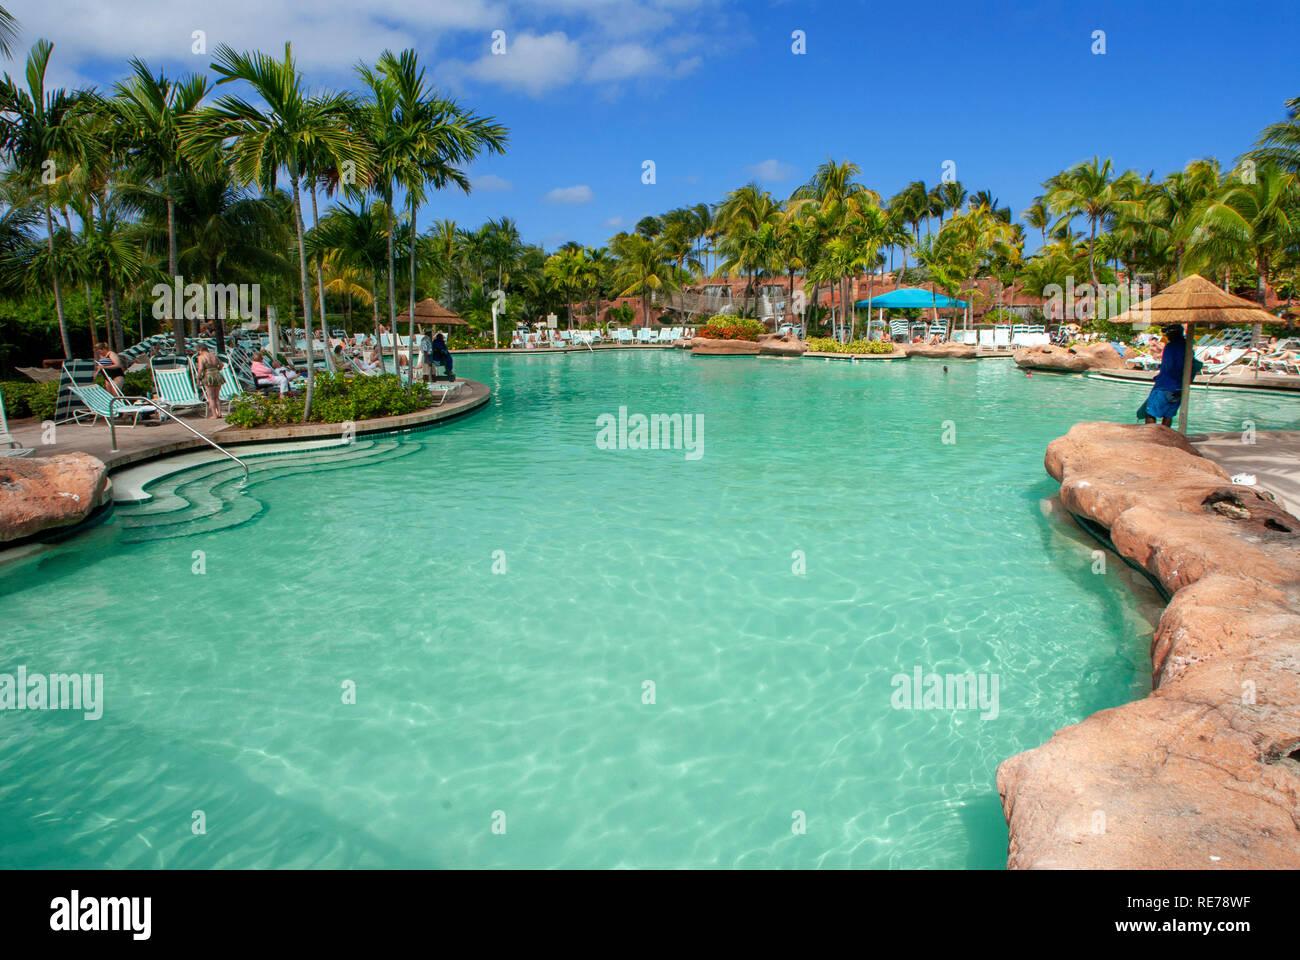 Swimming Pool Atlantis Paradise Island Stockfotos Und Bilder Kaufen Alamy